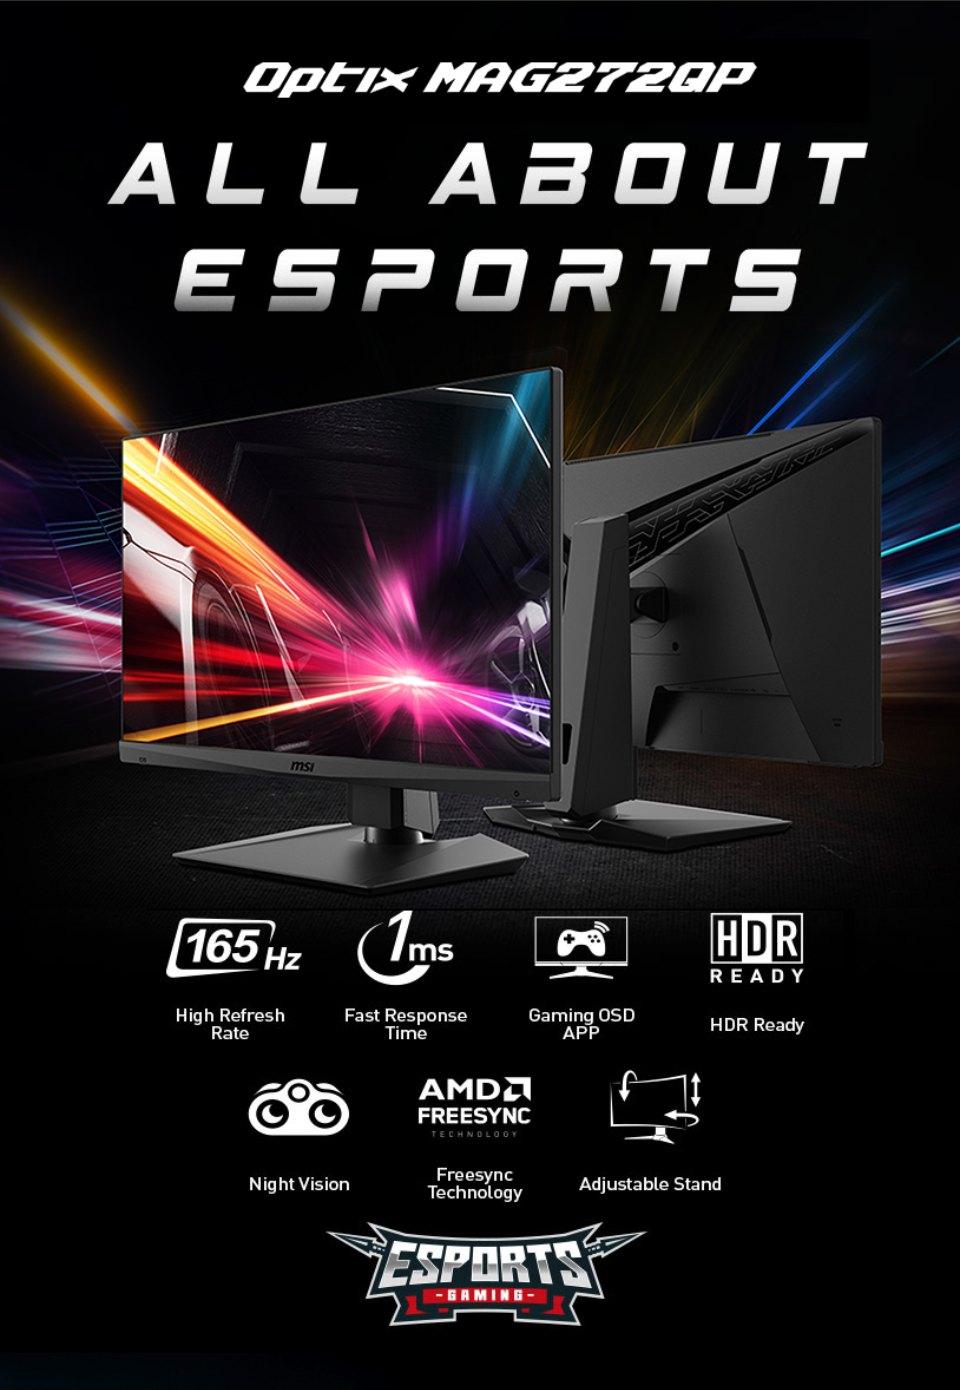 MSI Optix MAG272QP QHD165Hz HDR 27in VA Gaming Monitor features